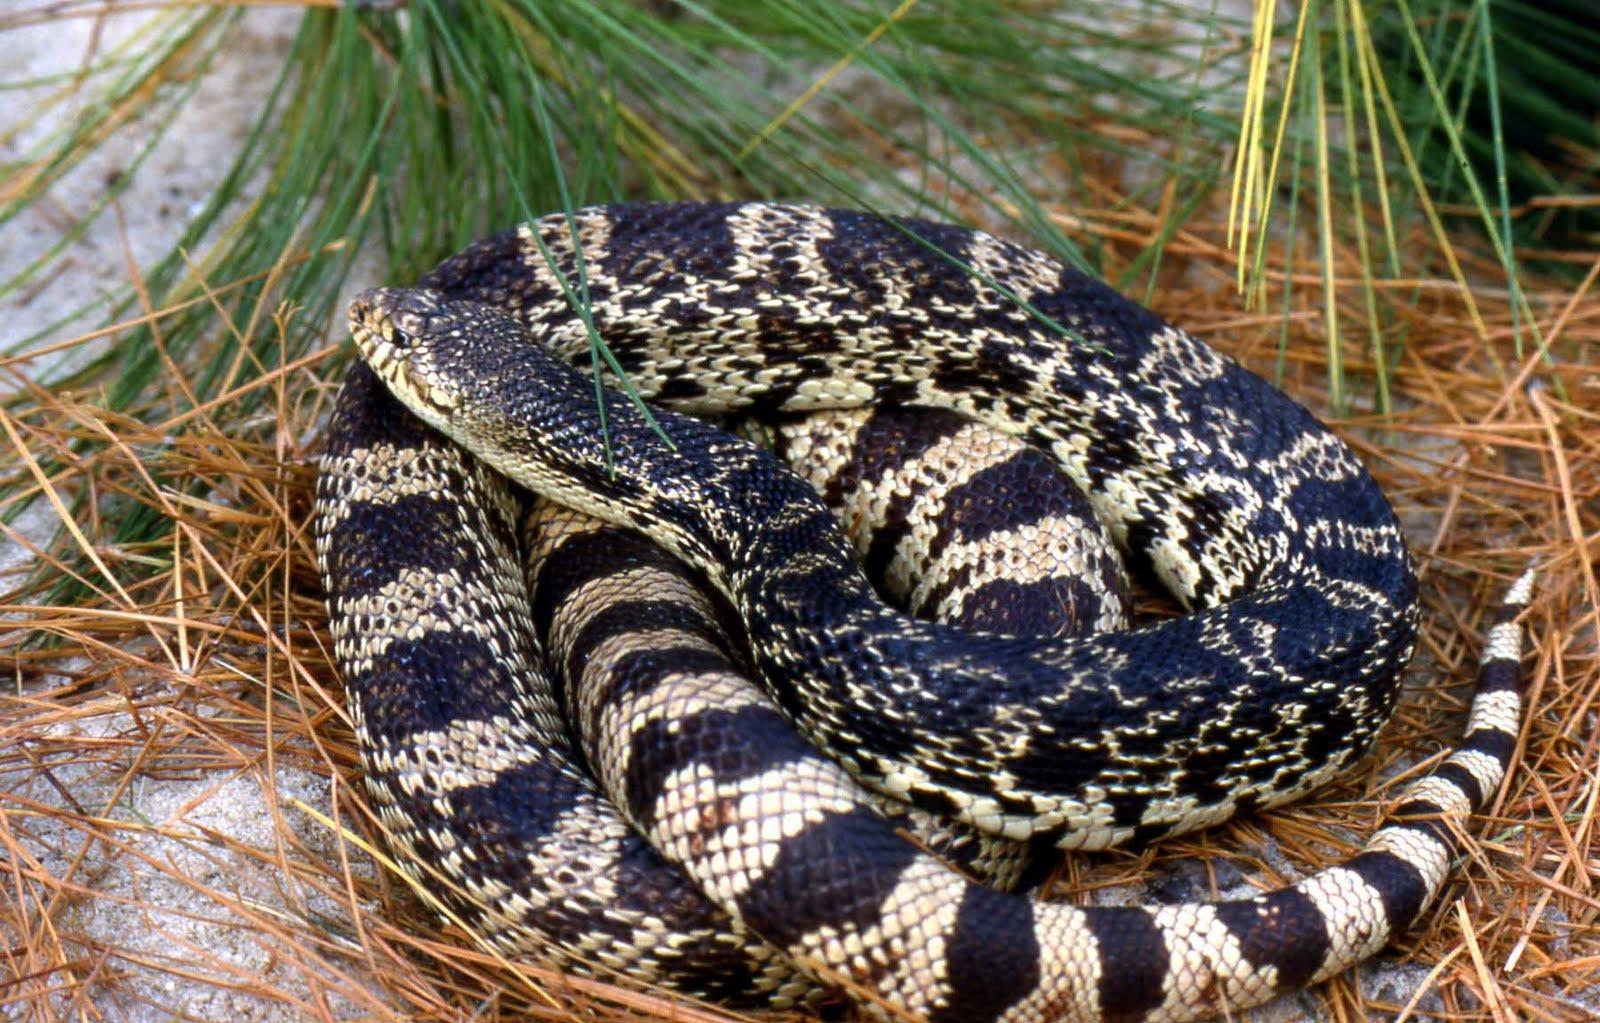 Non venomous snake pictures